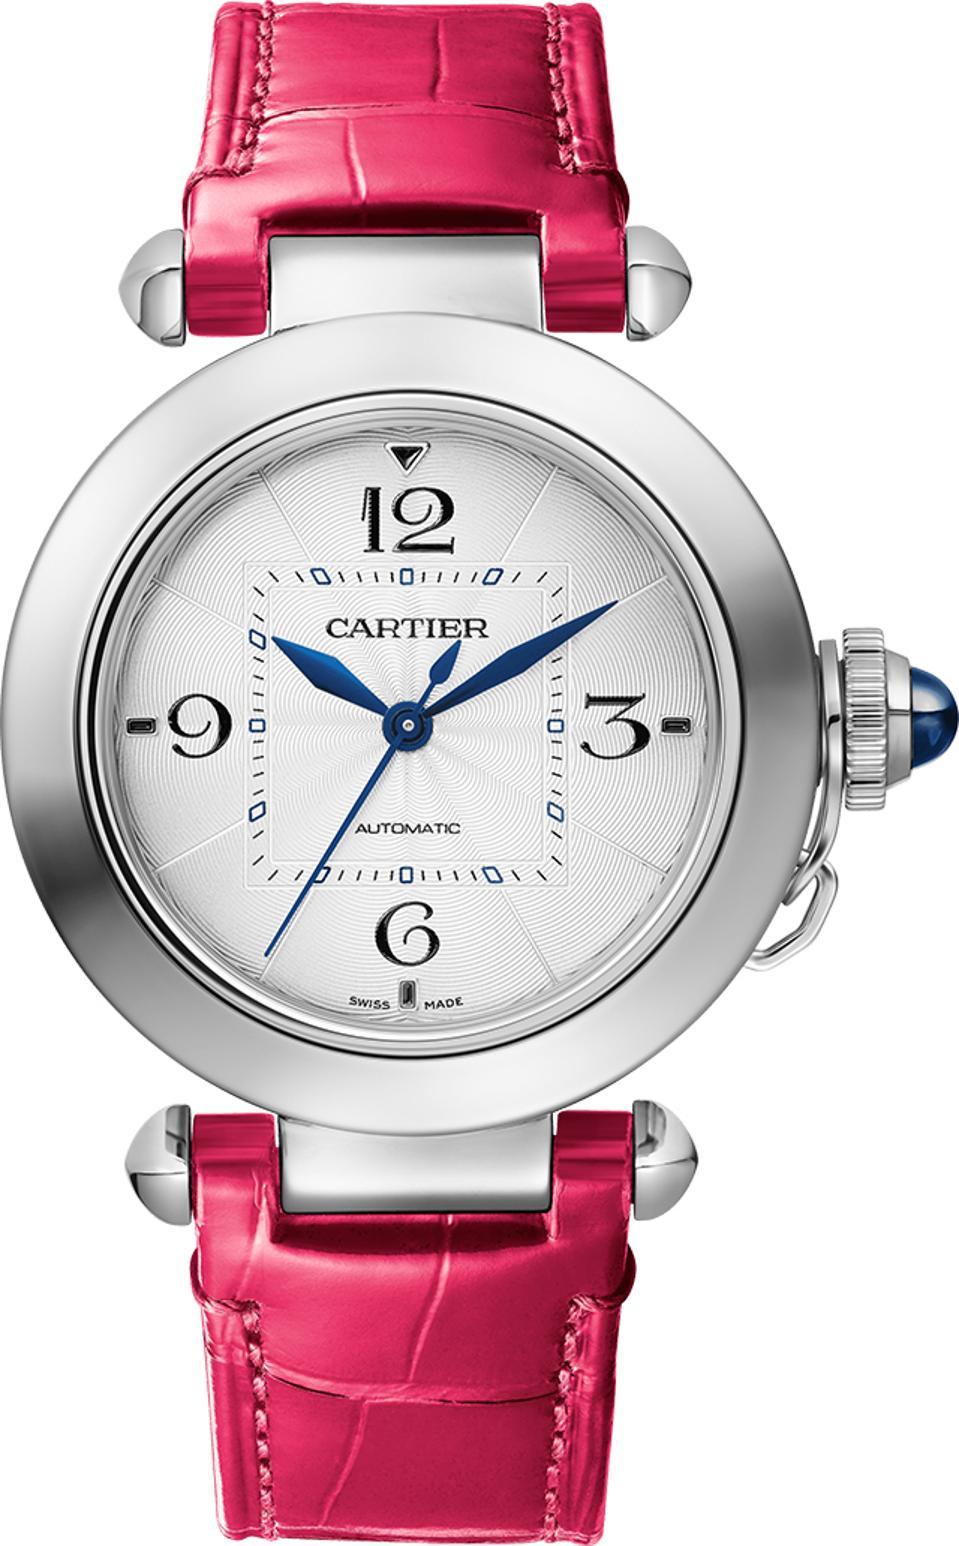 The new Pasha de Cartier comes with bracelet or interchangeable straps.